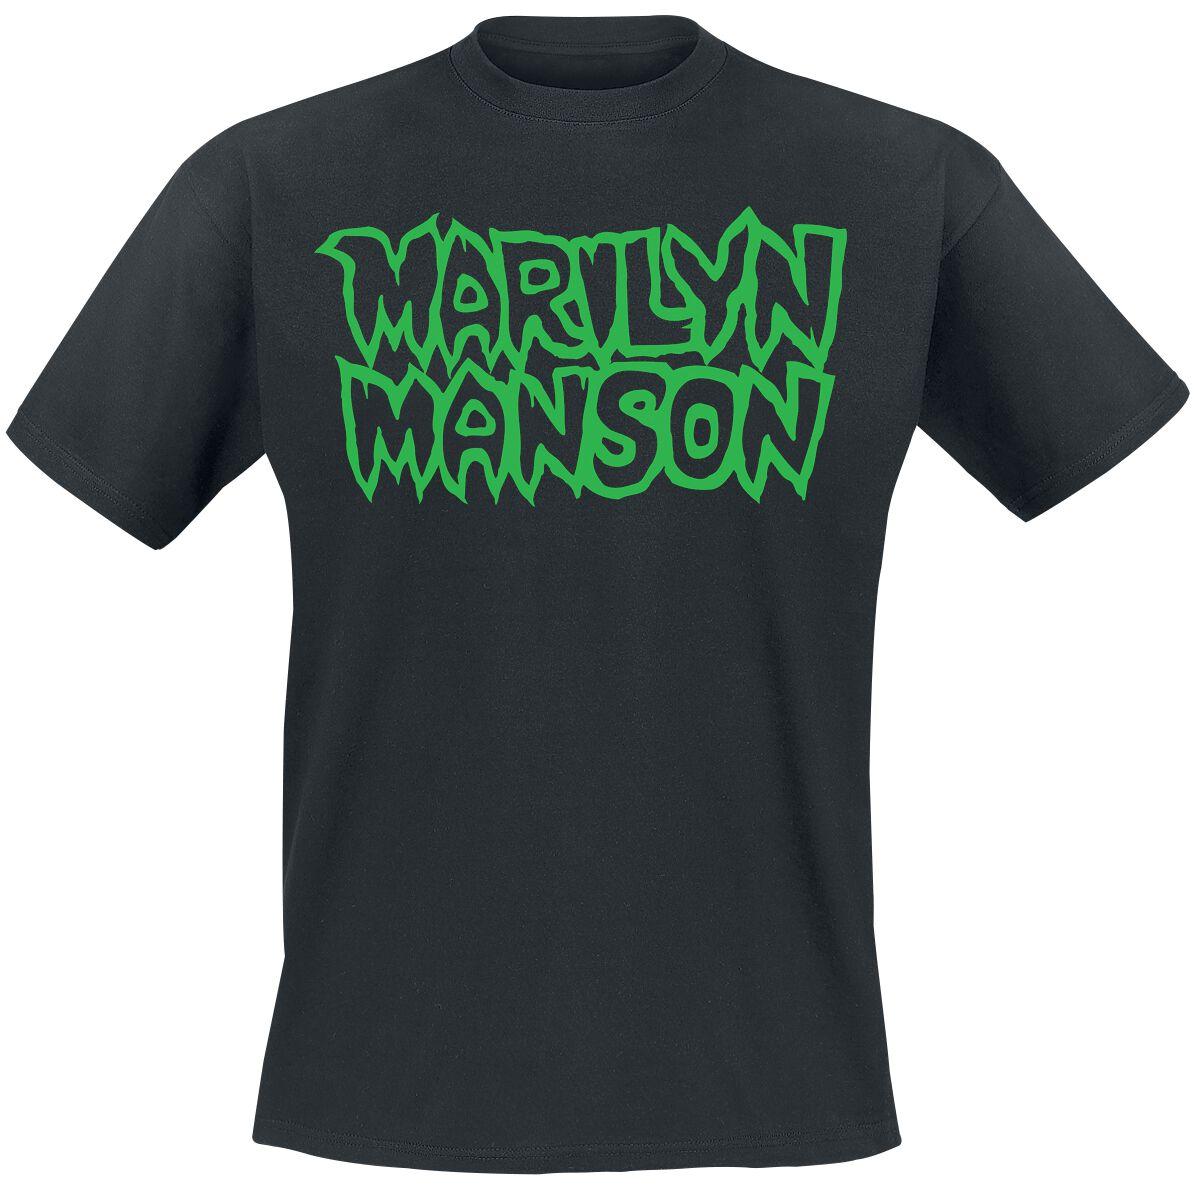 Zespoły - Koszulki - T-Shirt Marilyn Manson Classic Logo T-Shirt czarny - 373172